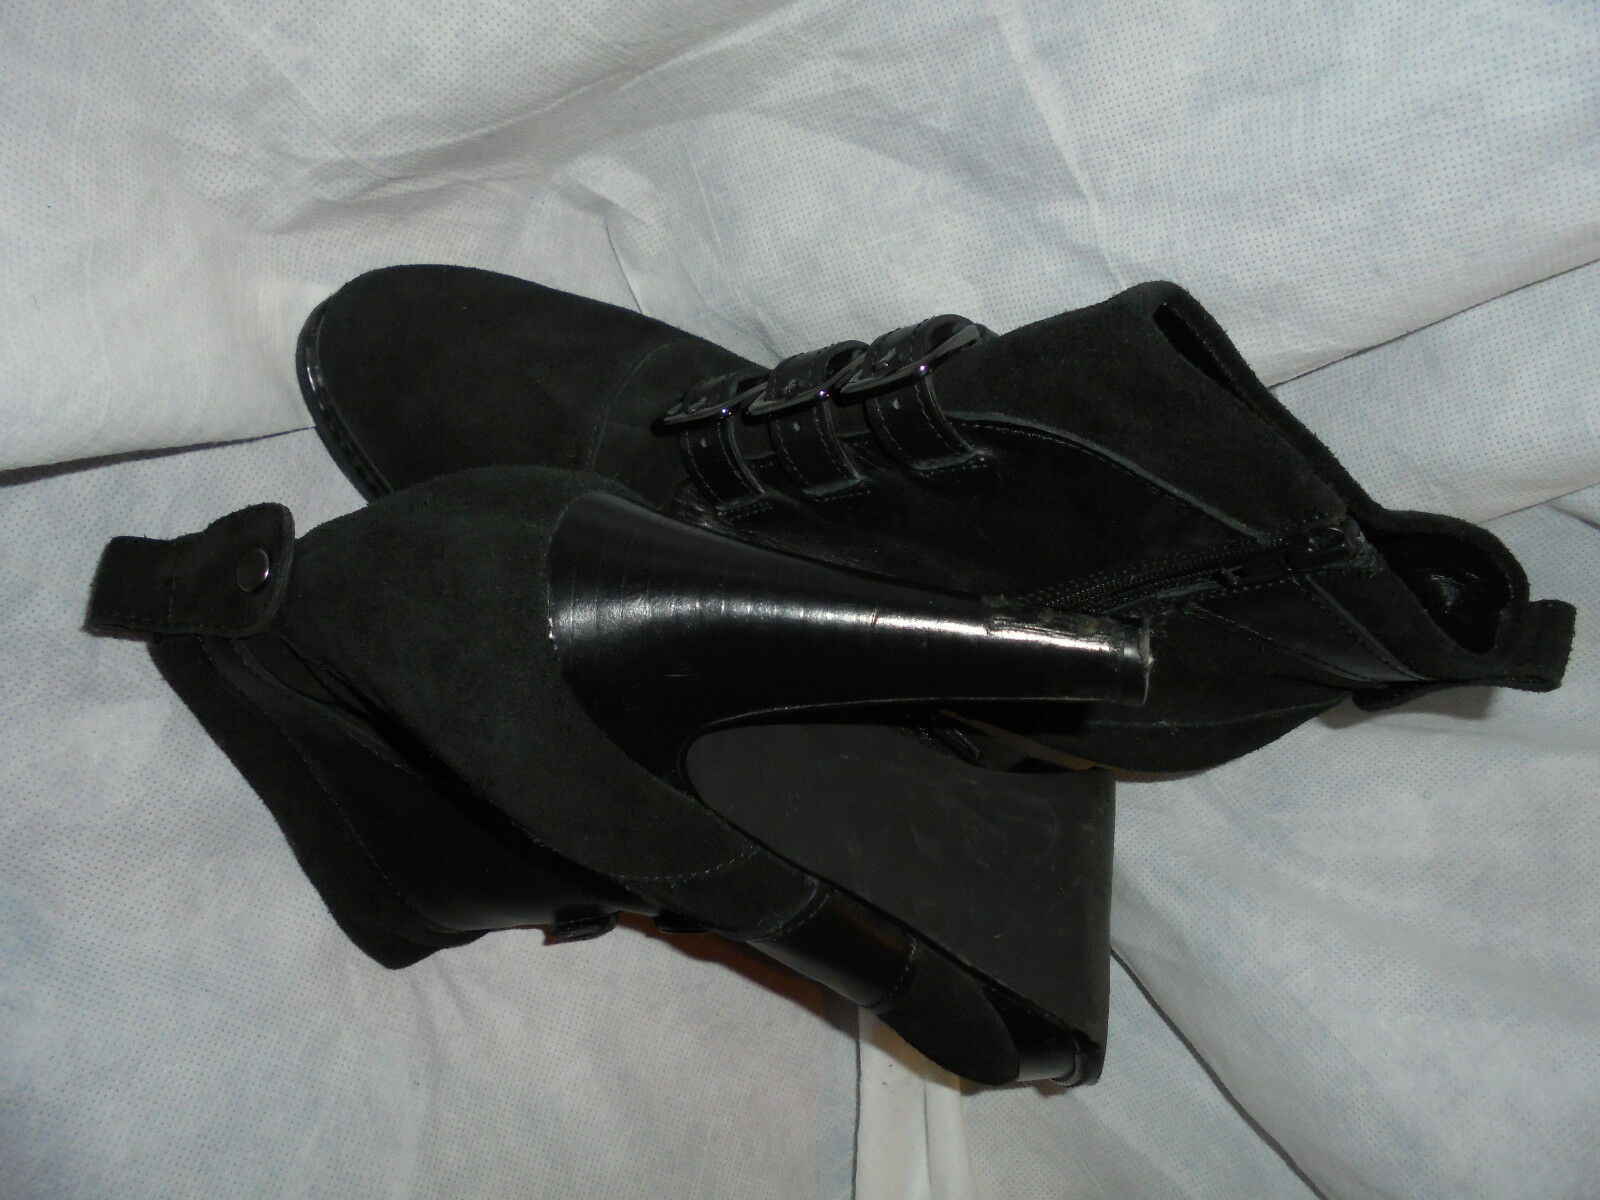 M &  S AUTOGRAPH Damenschuhe BLACK  & SUEDE/LEATHER LACE UP HEEL BOOT SIZE UK 7 EU 40 VGC 9f51f4